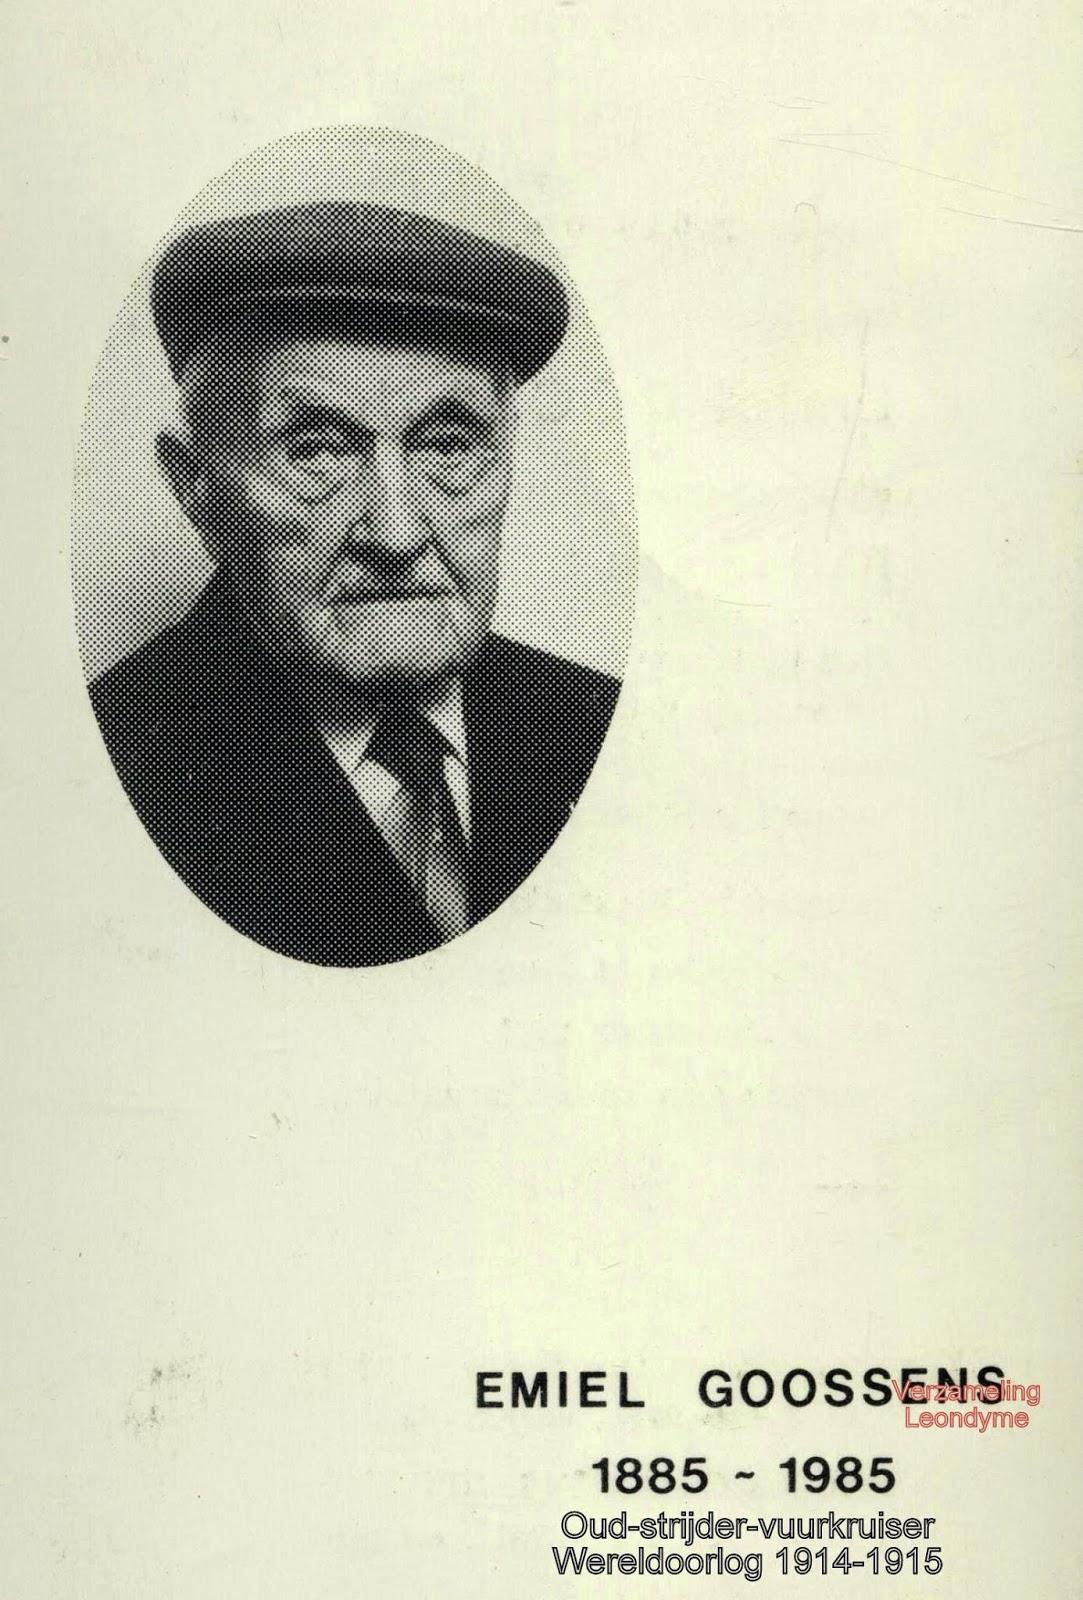 Bidprentje, Emiel Goossens 1885-1985. Verzameling Leondyme.